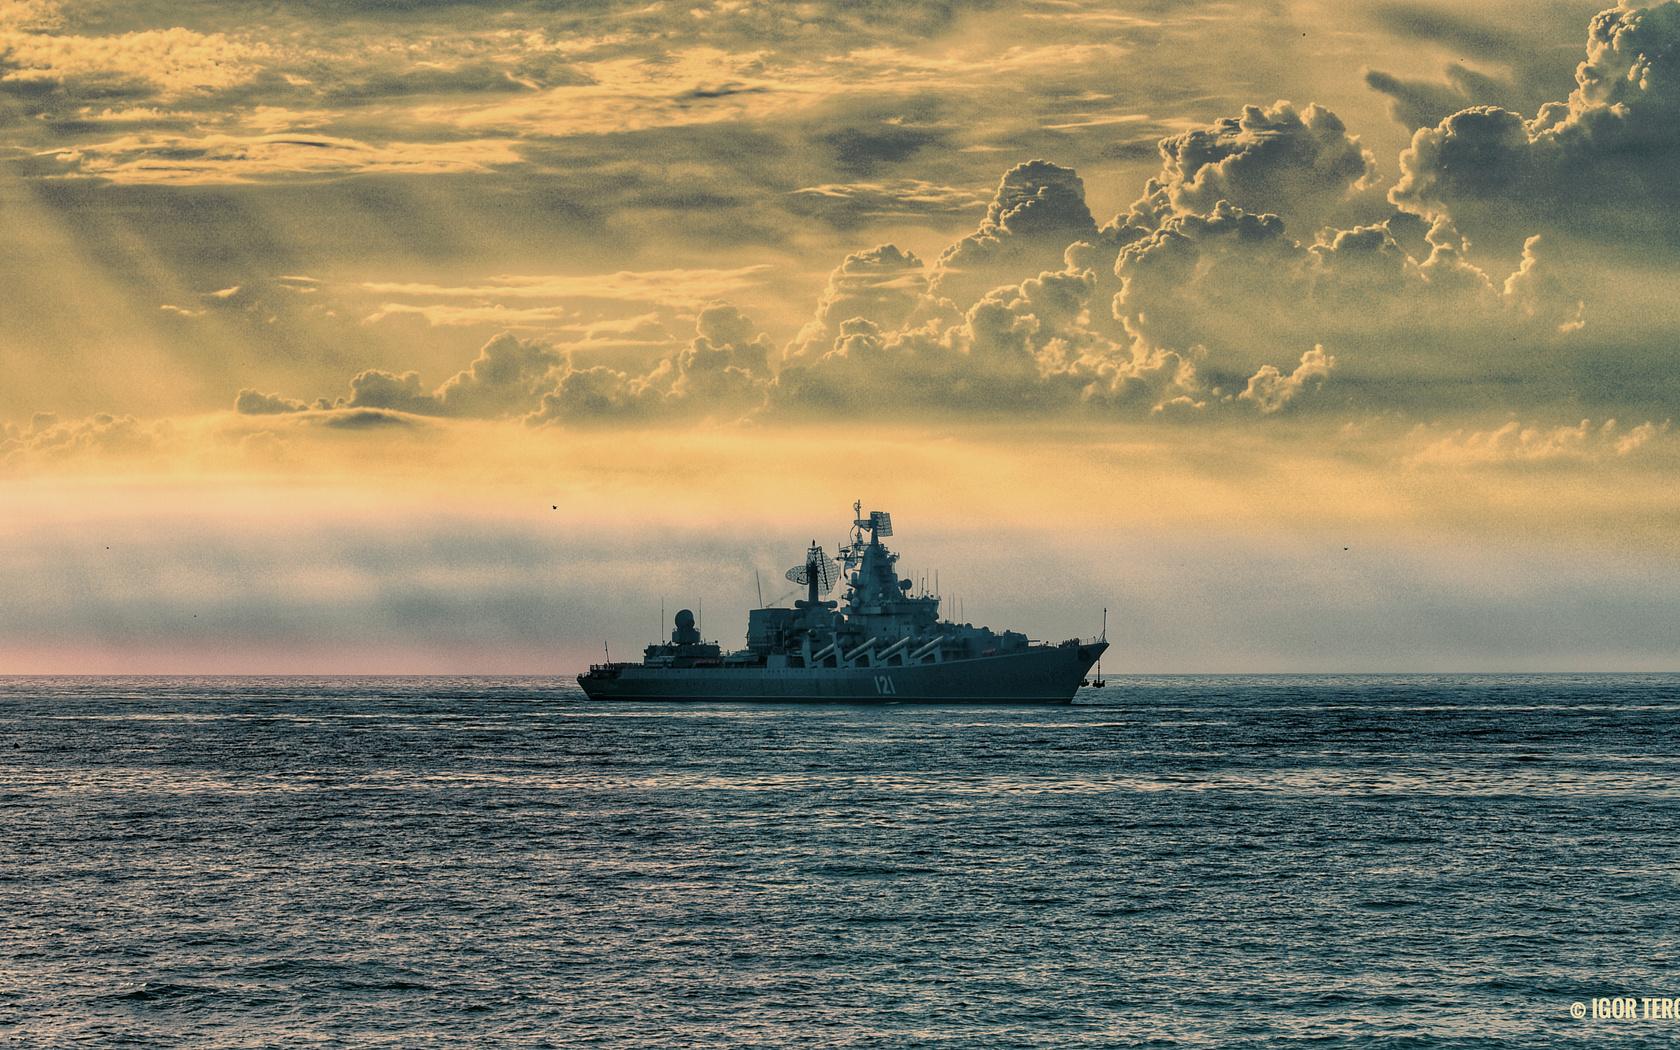 крейсер, море, вечер